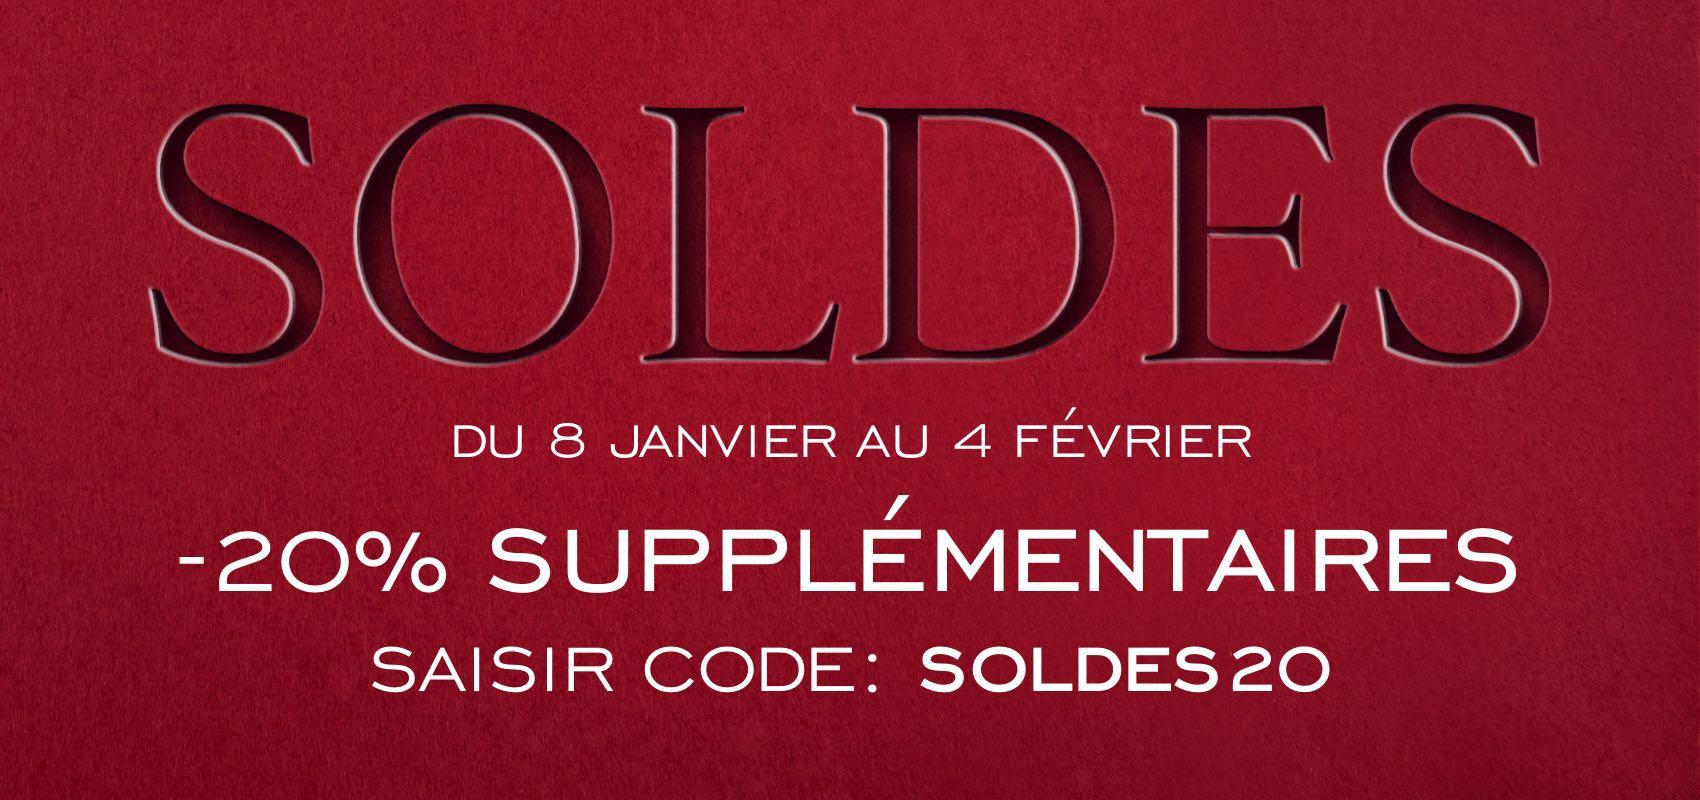 SOLDES. -20% supplémentaires. SAISIR CODE : SOLDES20.